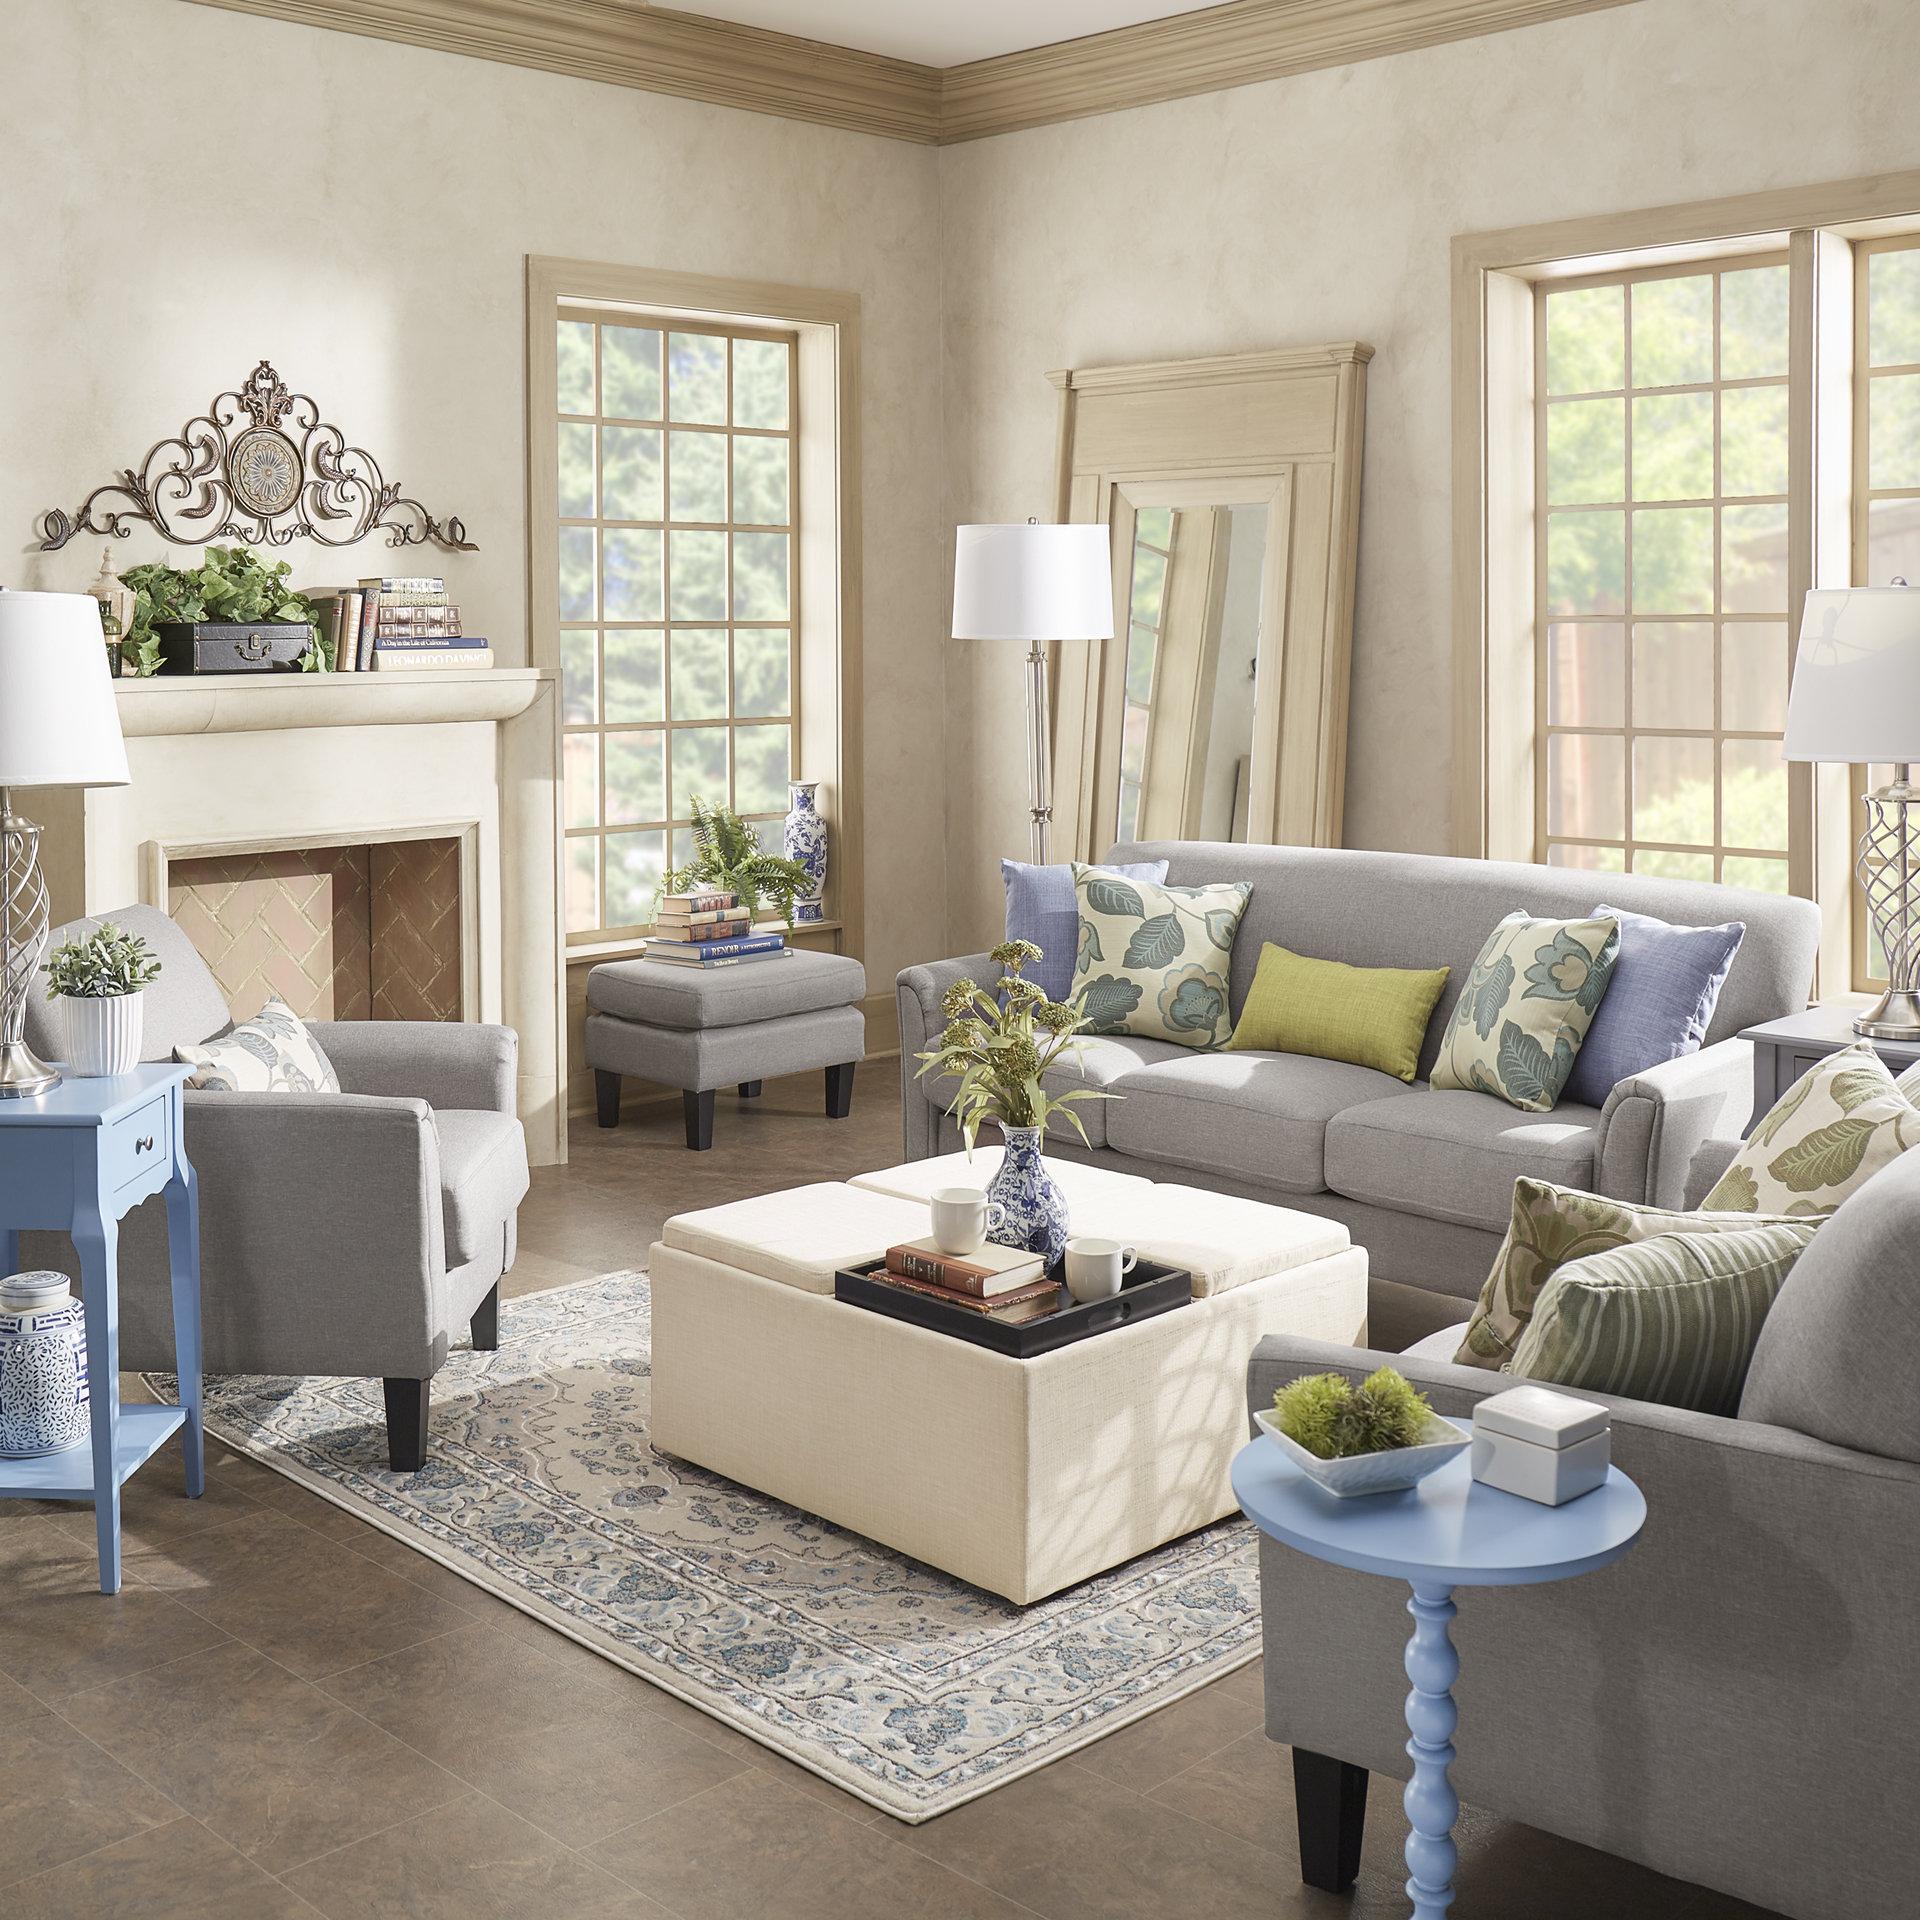 Merveilleux Country Chic Living Room   Wayfair